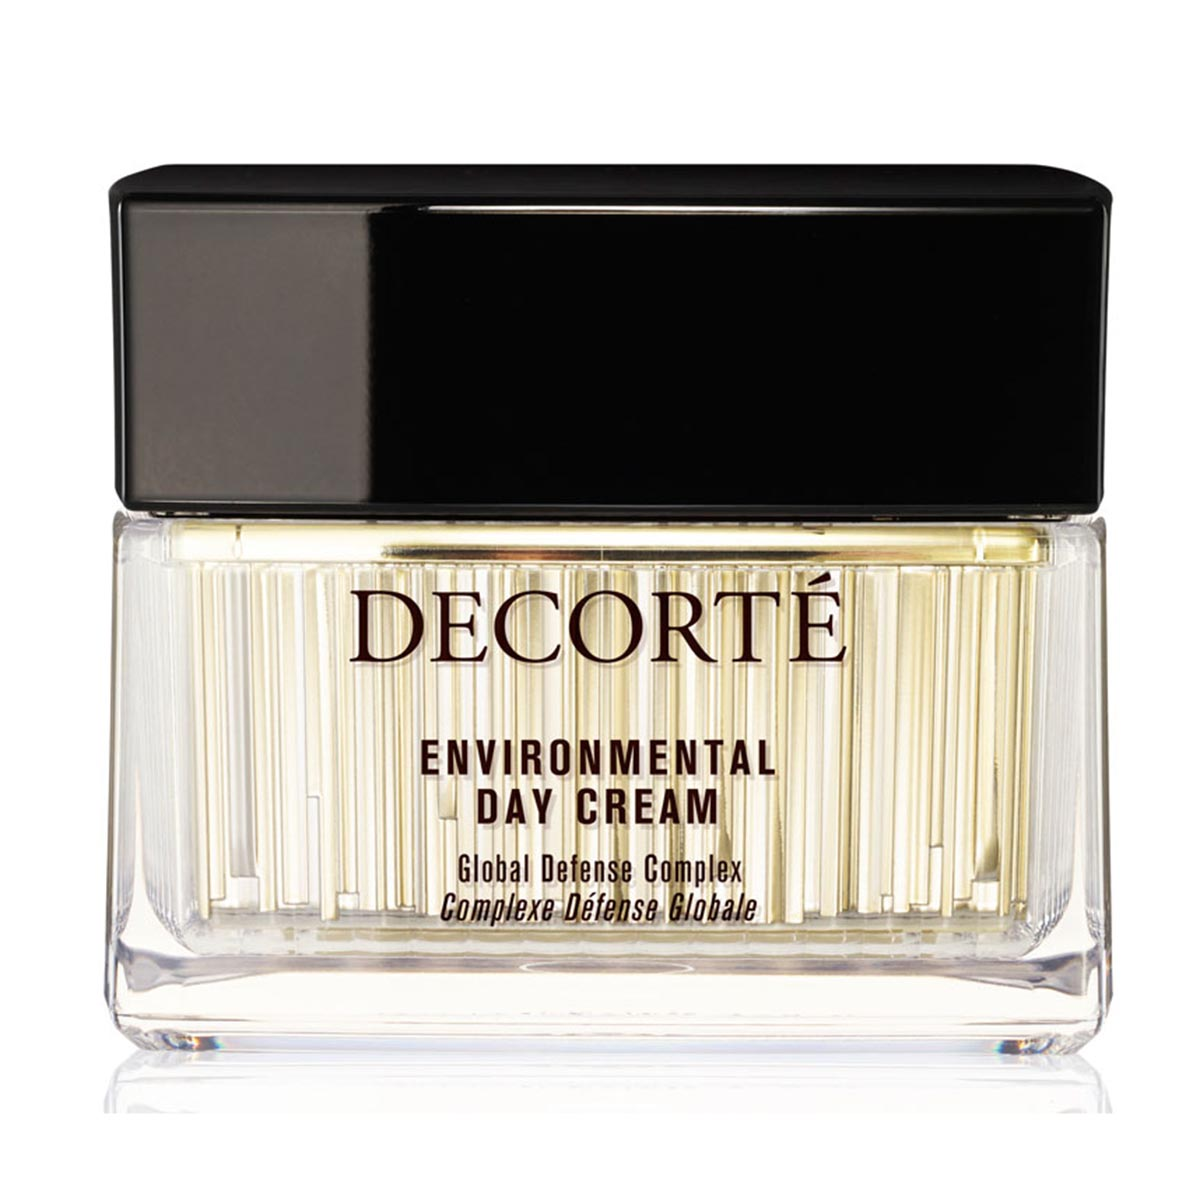 Cosme decorte environmental day cream 50ml